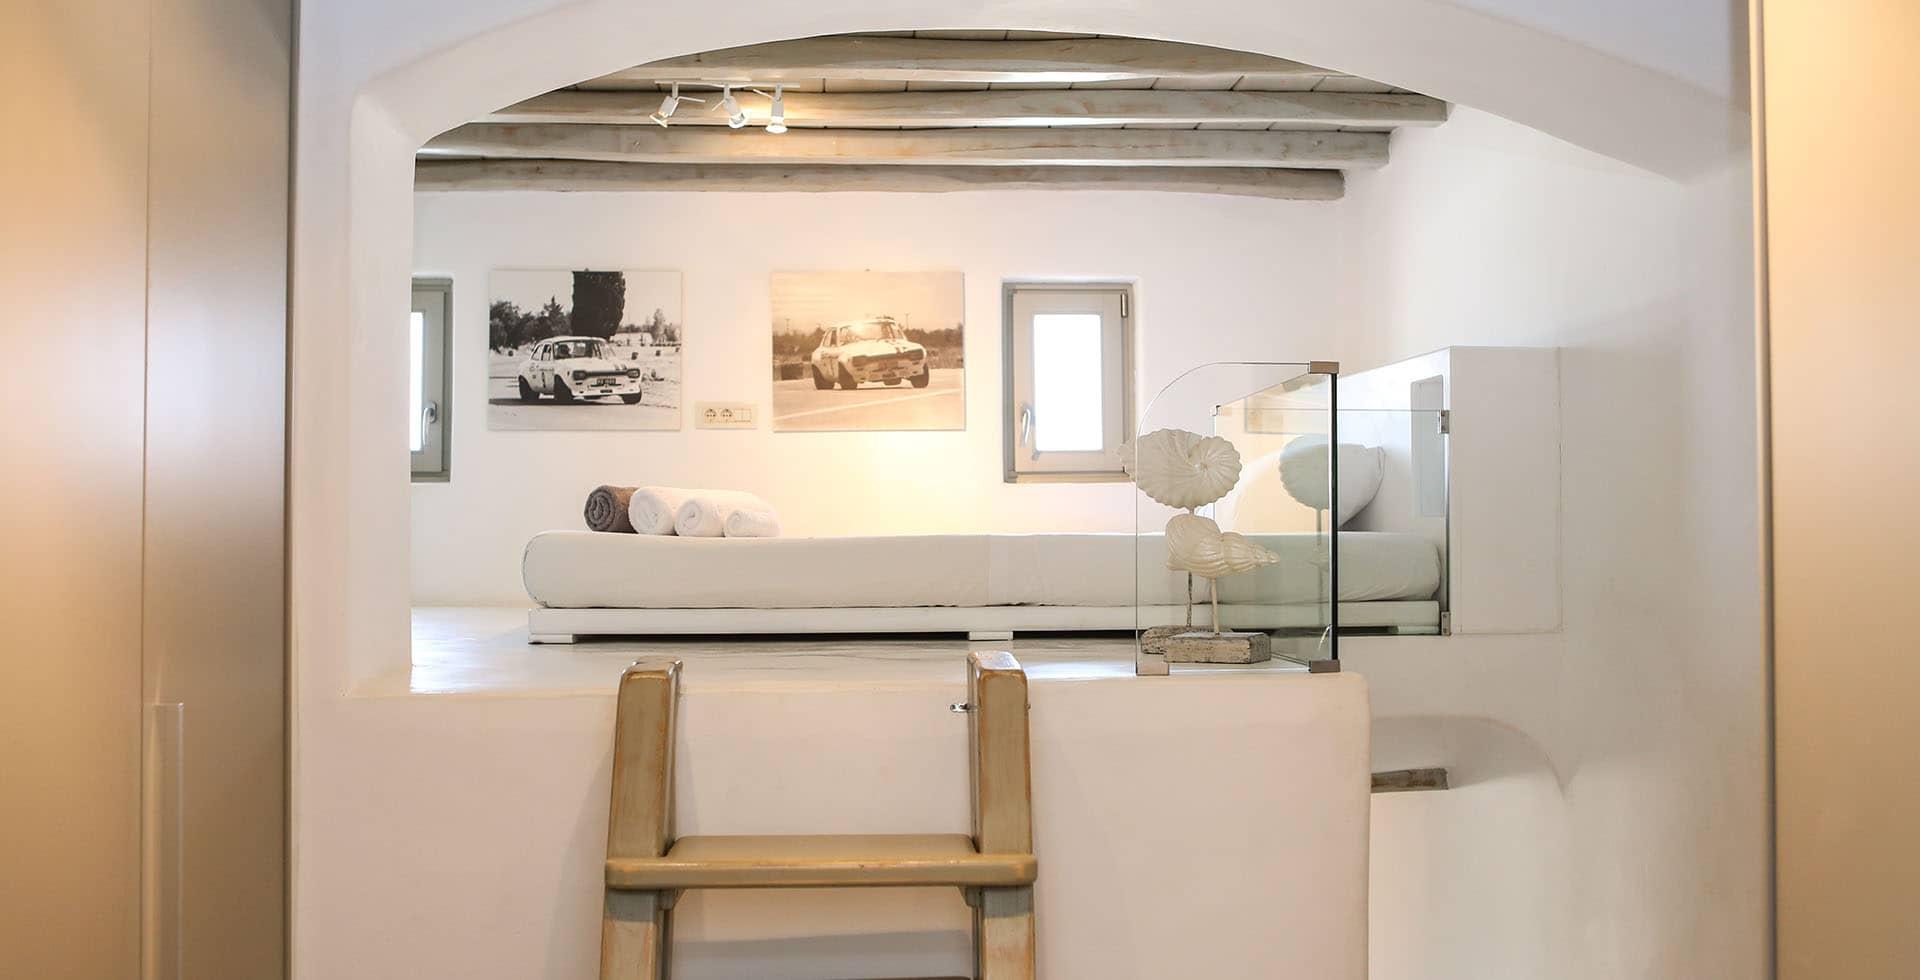 casa di mare mykonos images